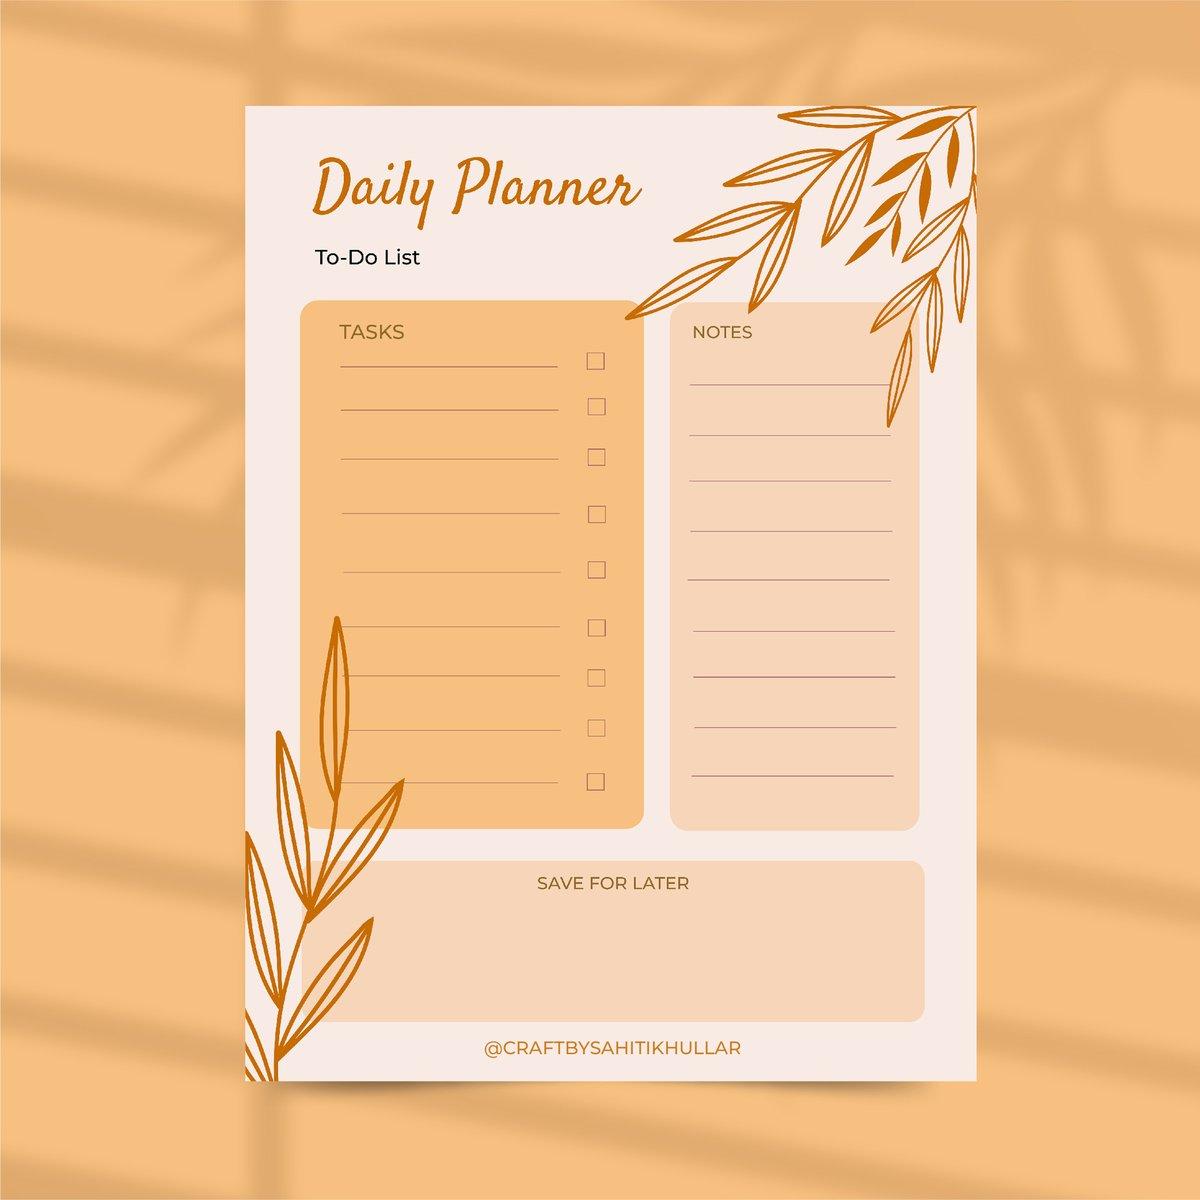 Printable Daily Planner Fillable, US Letter Daily Planner, Instant Download, Daily Planner, Task Organiser Print https://t.co/JyXiNtDZjT via @Etsy @EtsyIndia  #graphicdesign #wallart #digitalportrait #graphicdesigner #dailyplanner #todolist #DesiforPardes #etsyshop https://t.co/wcOYrgtvVW